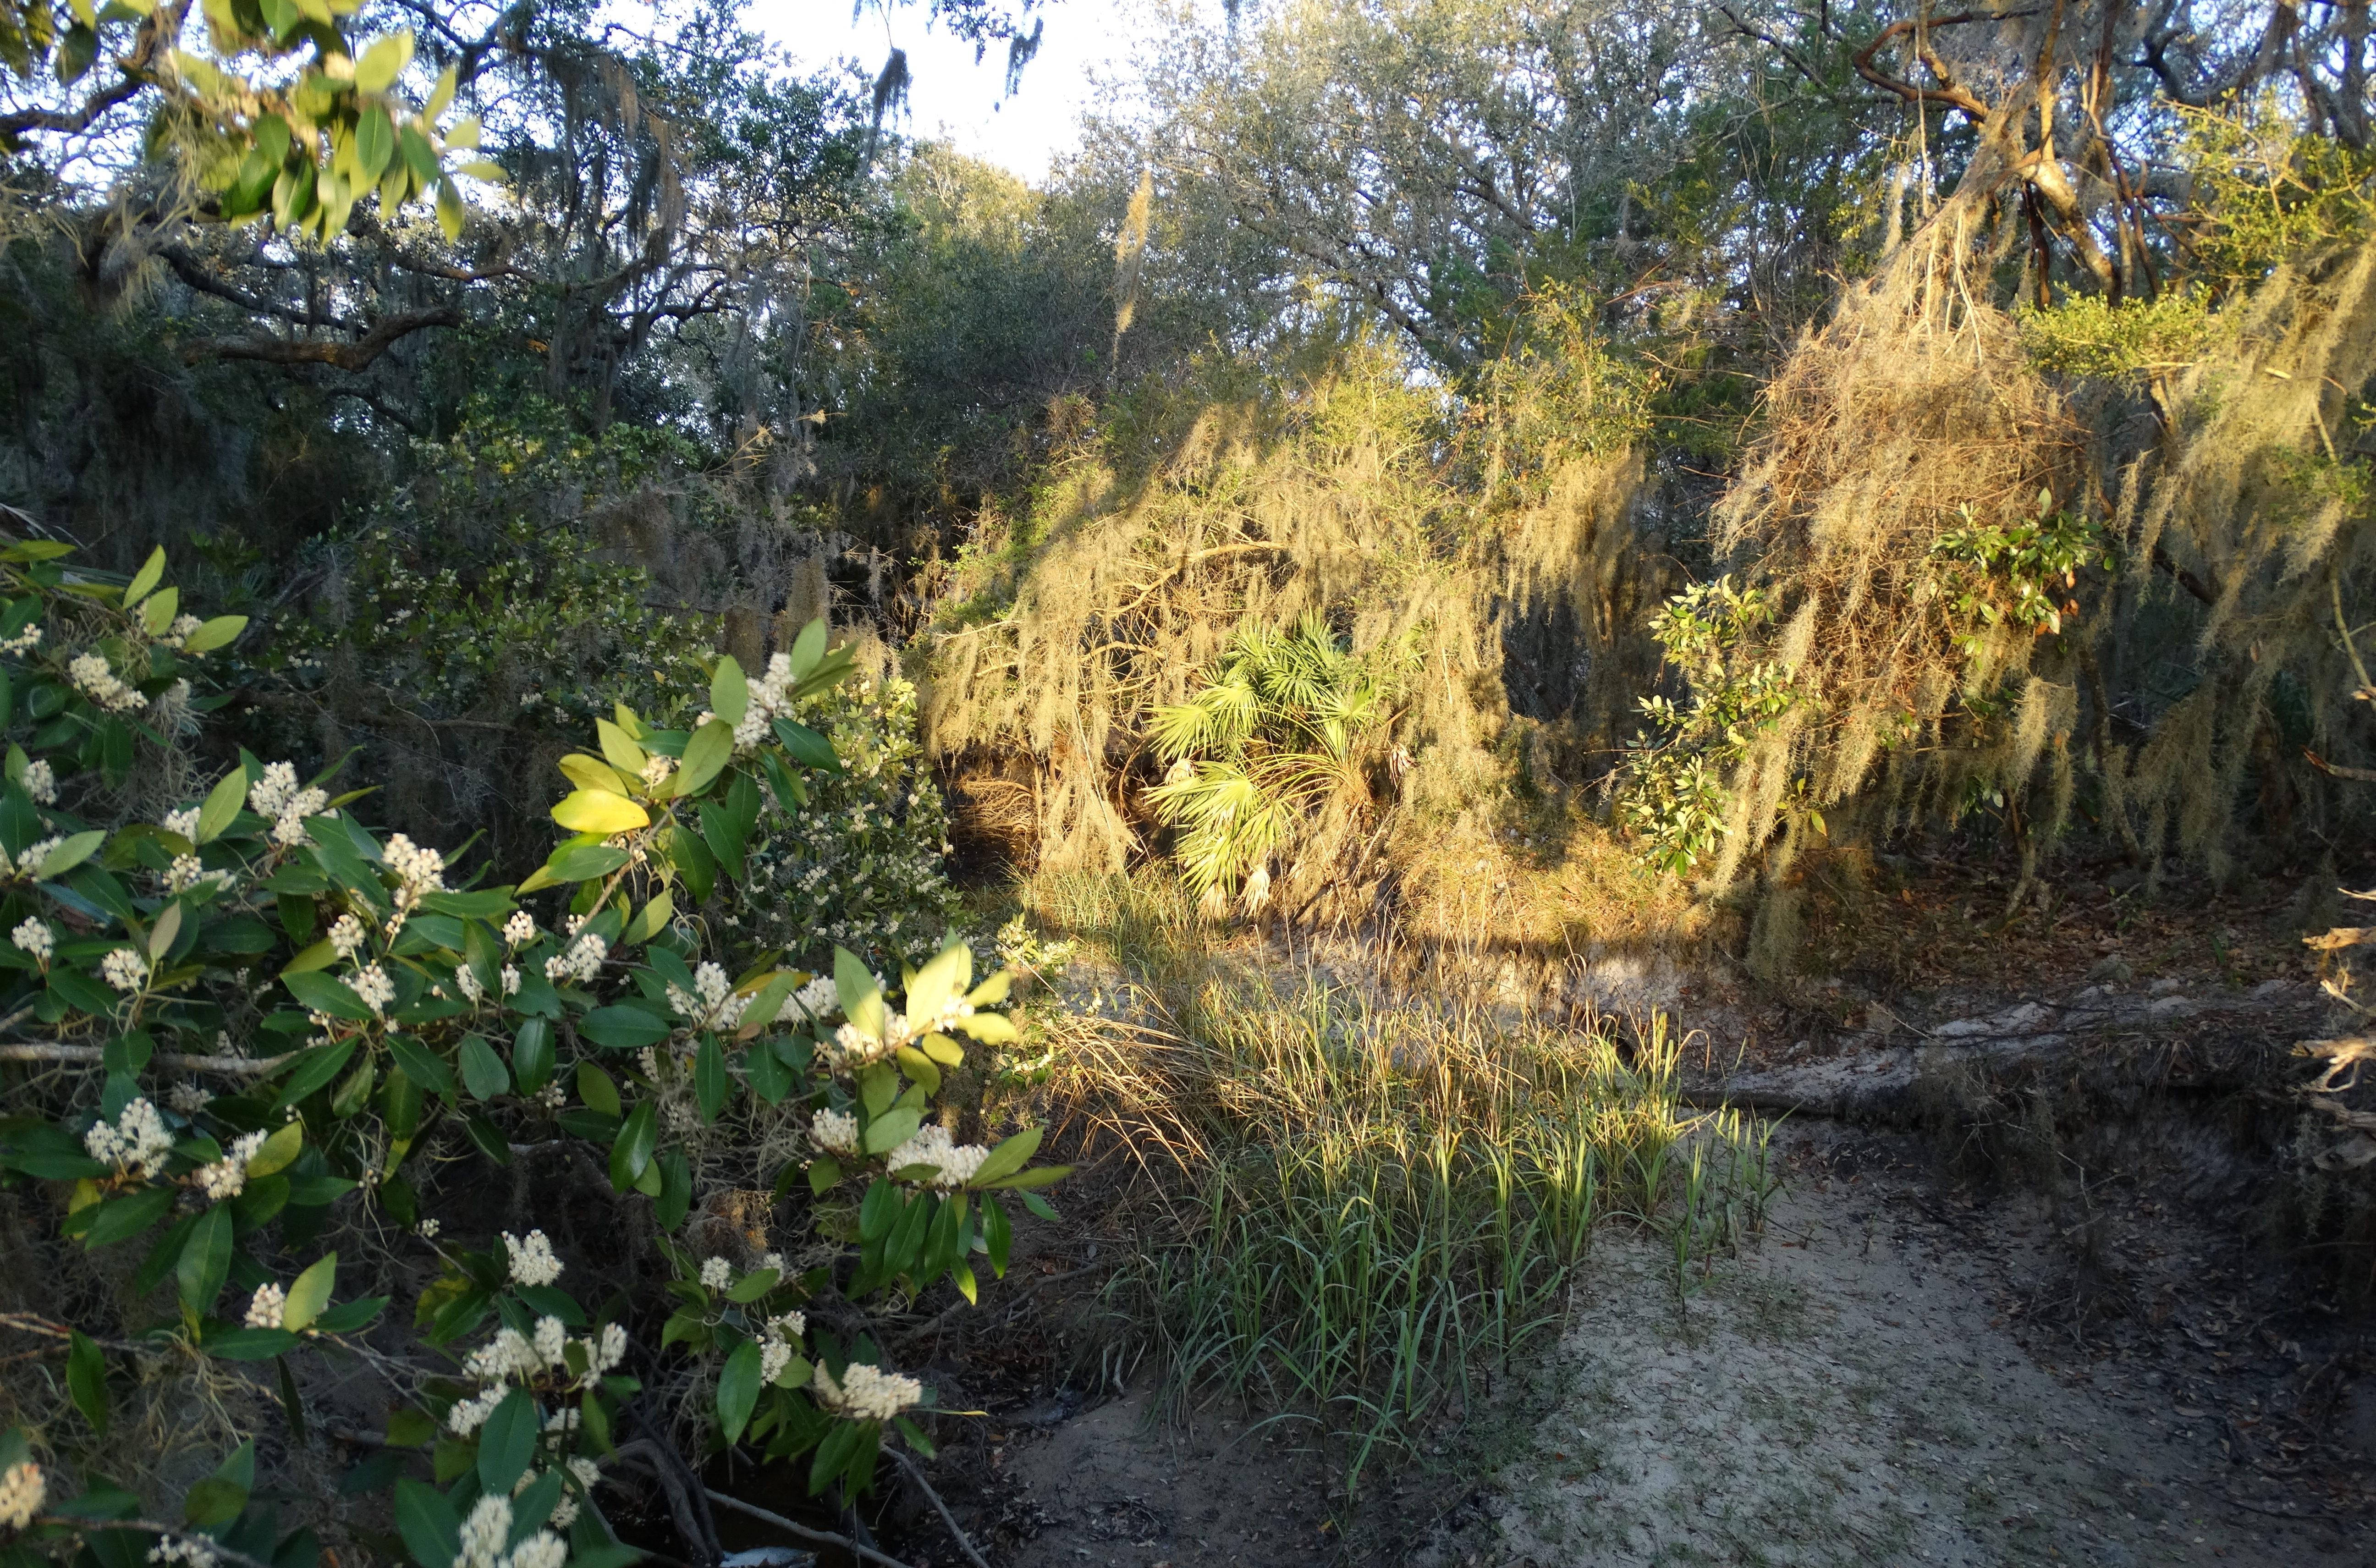 Fort Clinch area foliage